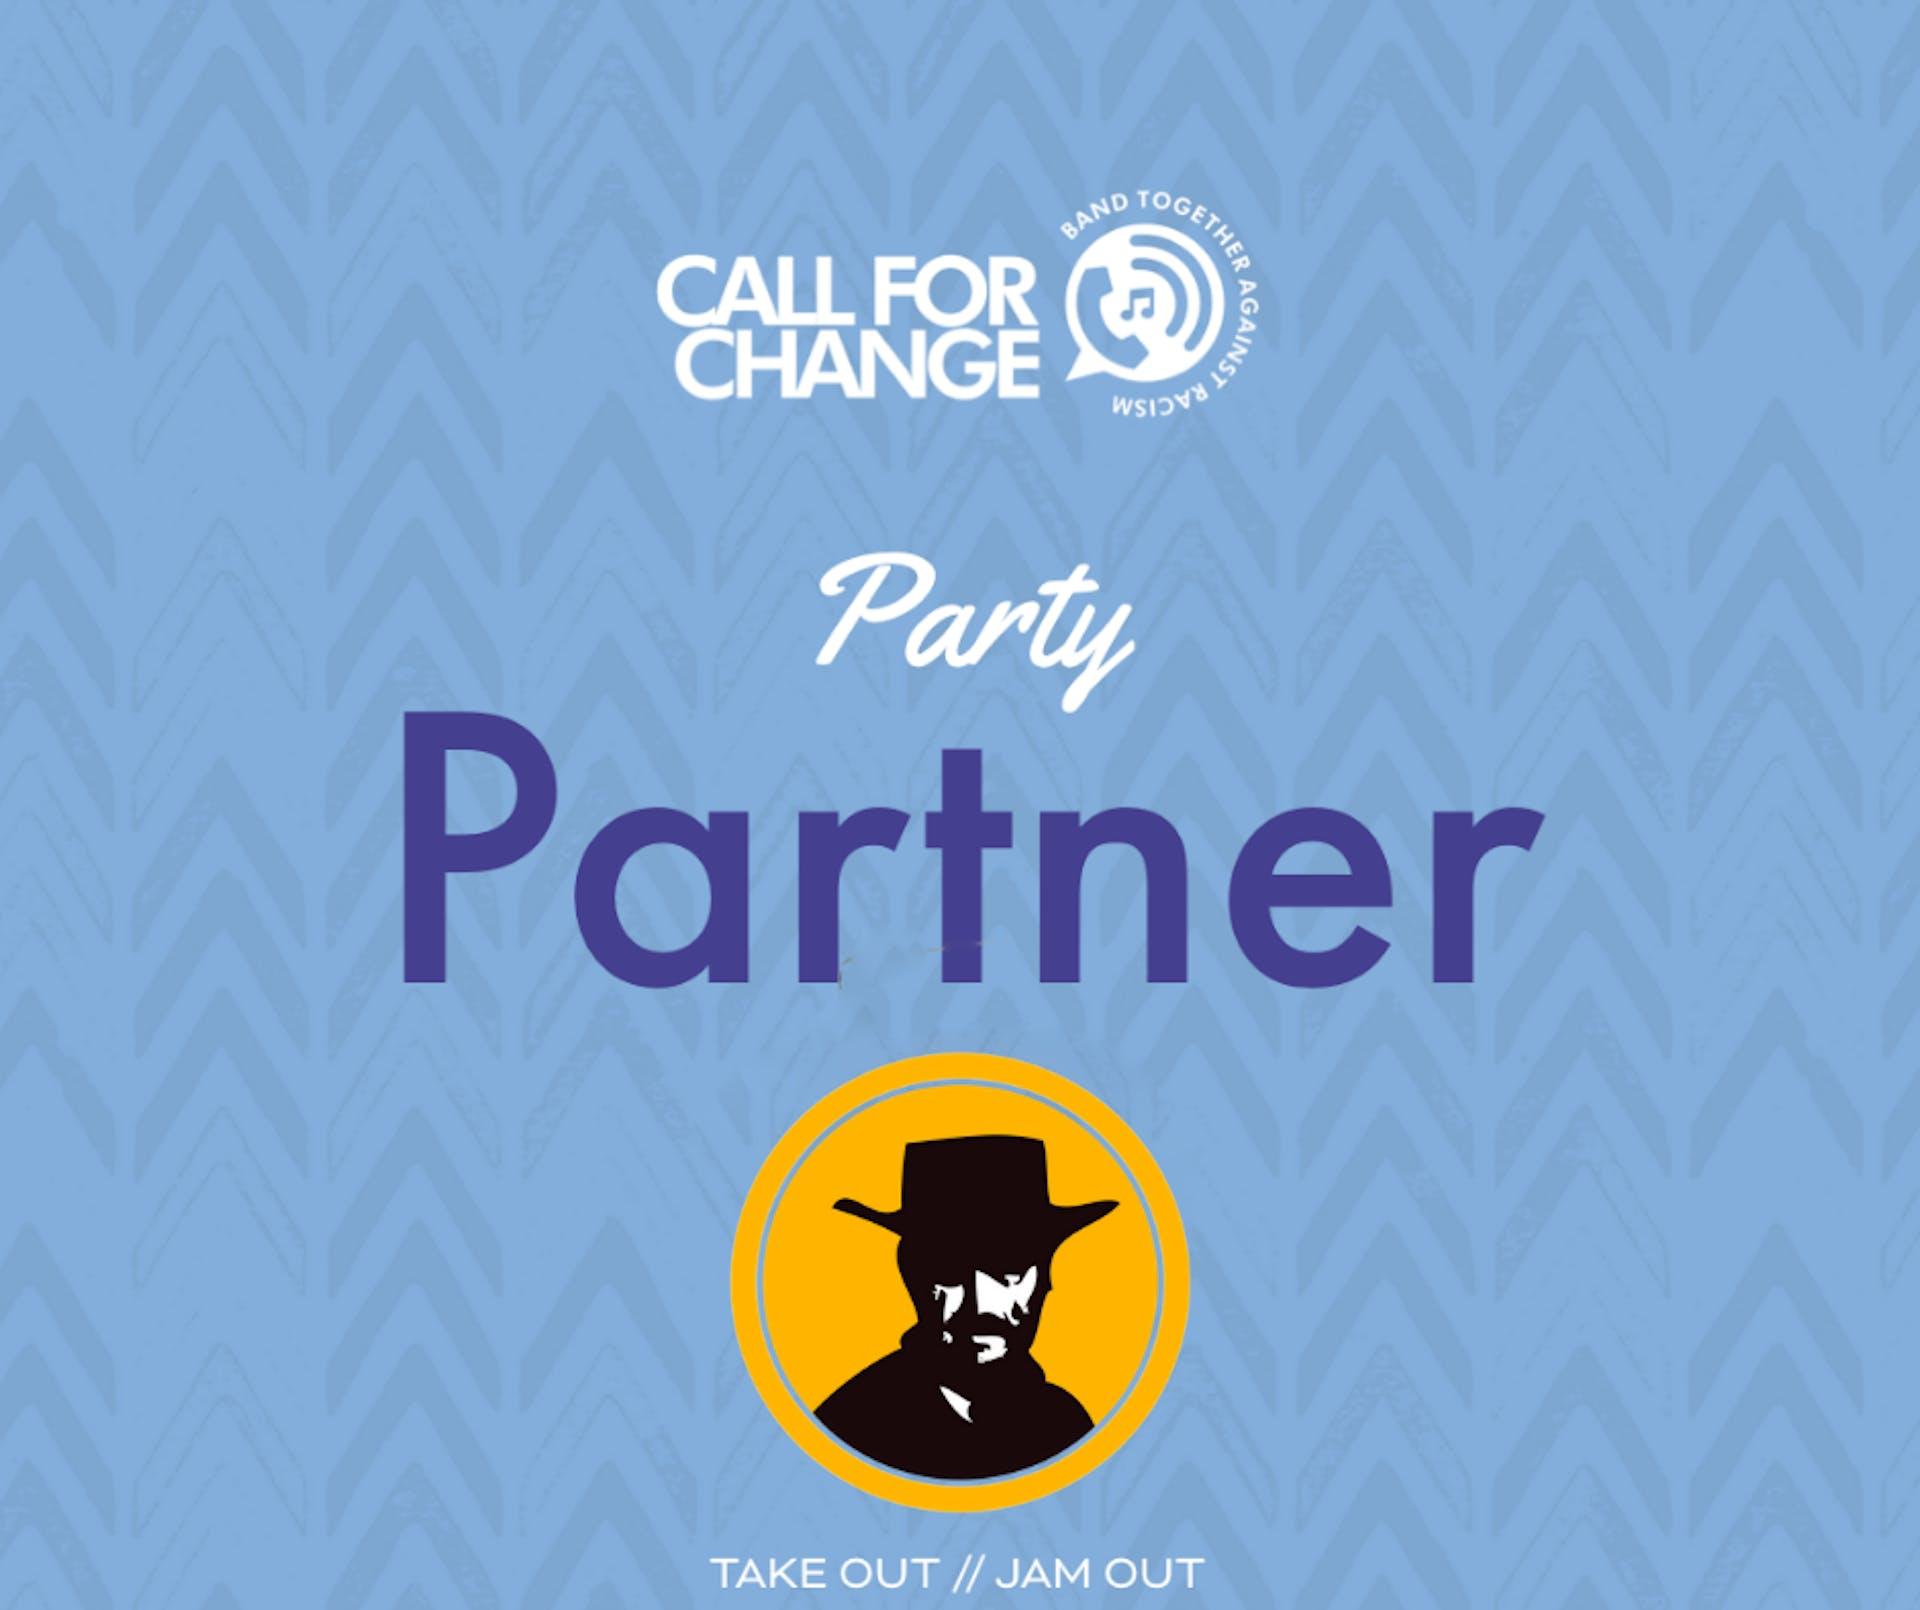 CFC Party Partner - Lonerider